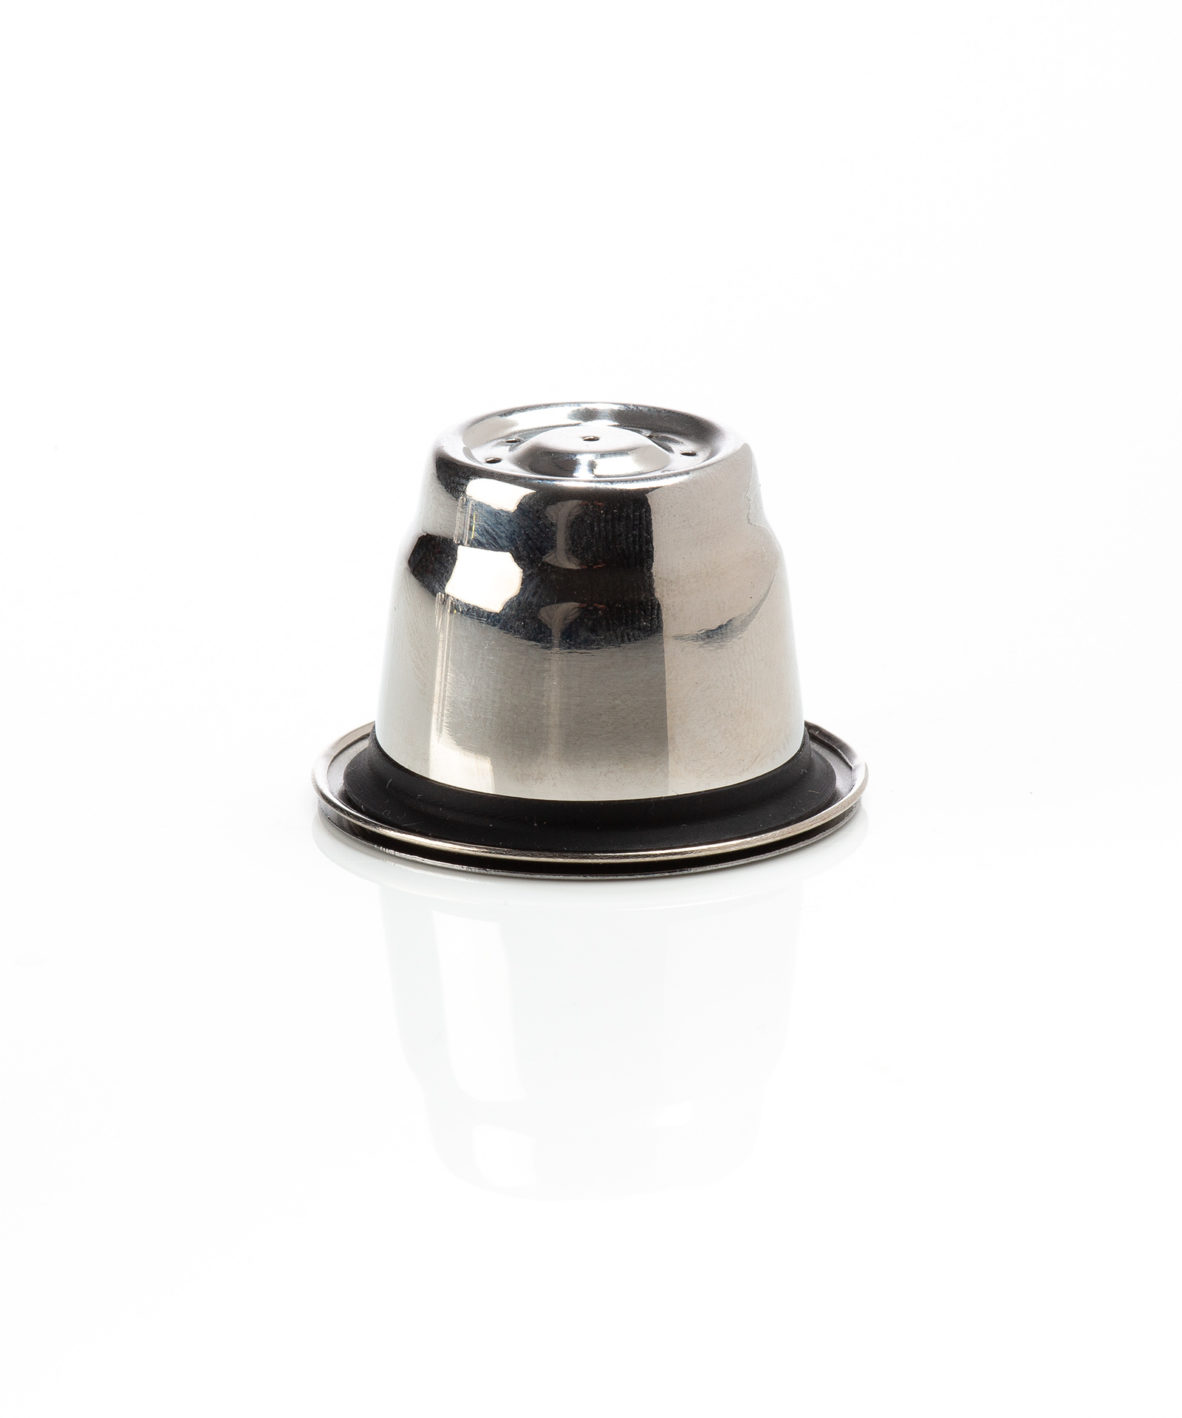 Capsulebio sélection capsule réutilisable : nespresso, capsule nespresso rechargeable, inox